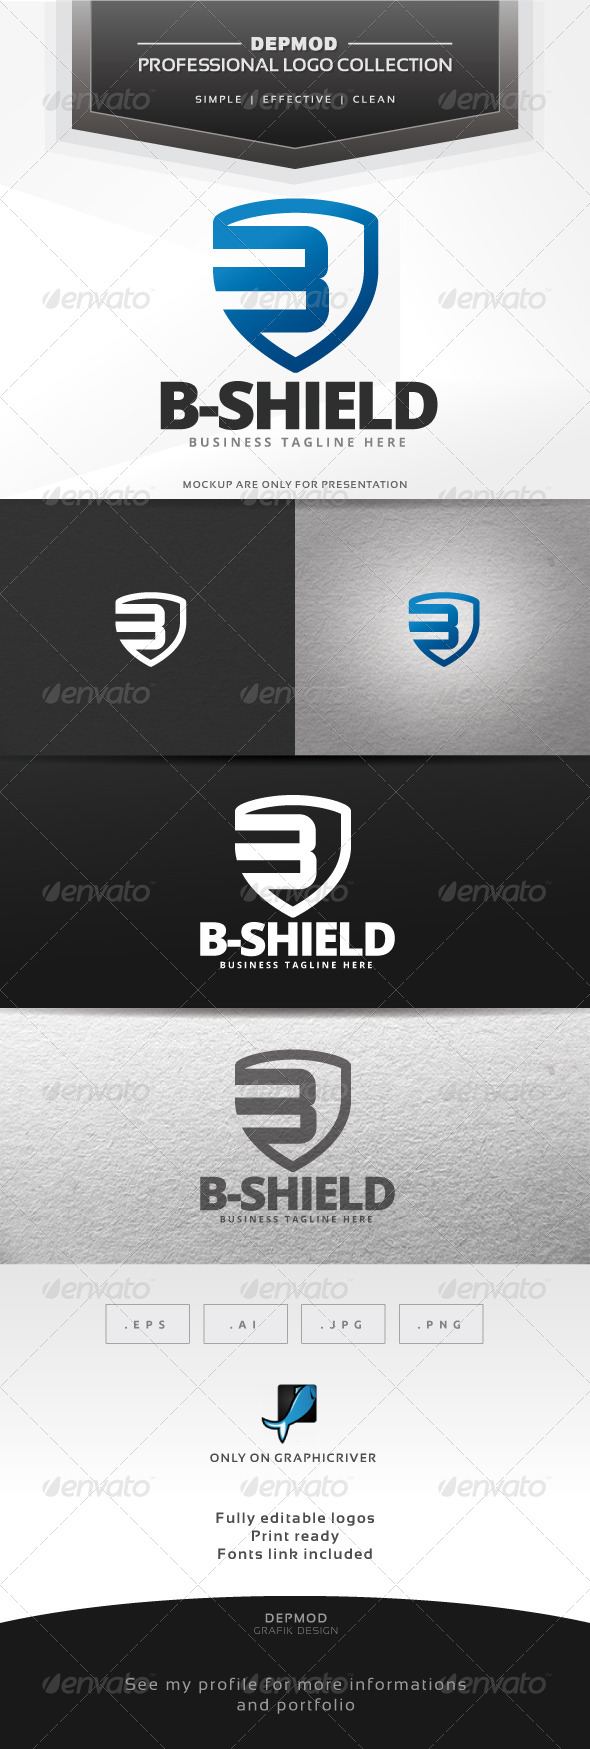 GraphicRiver B-Shield Logo 6552352